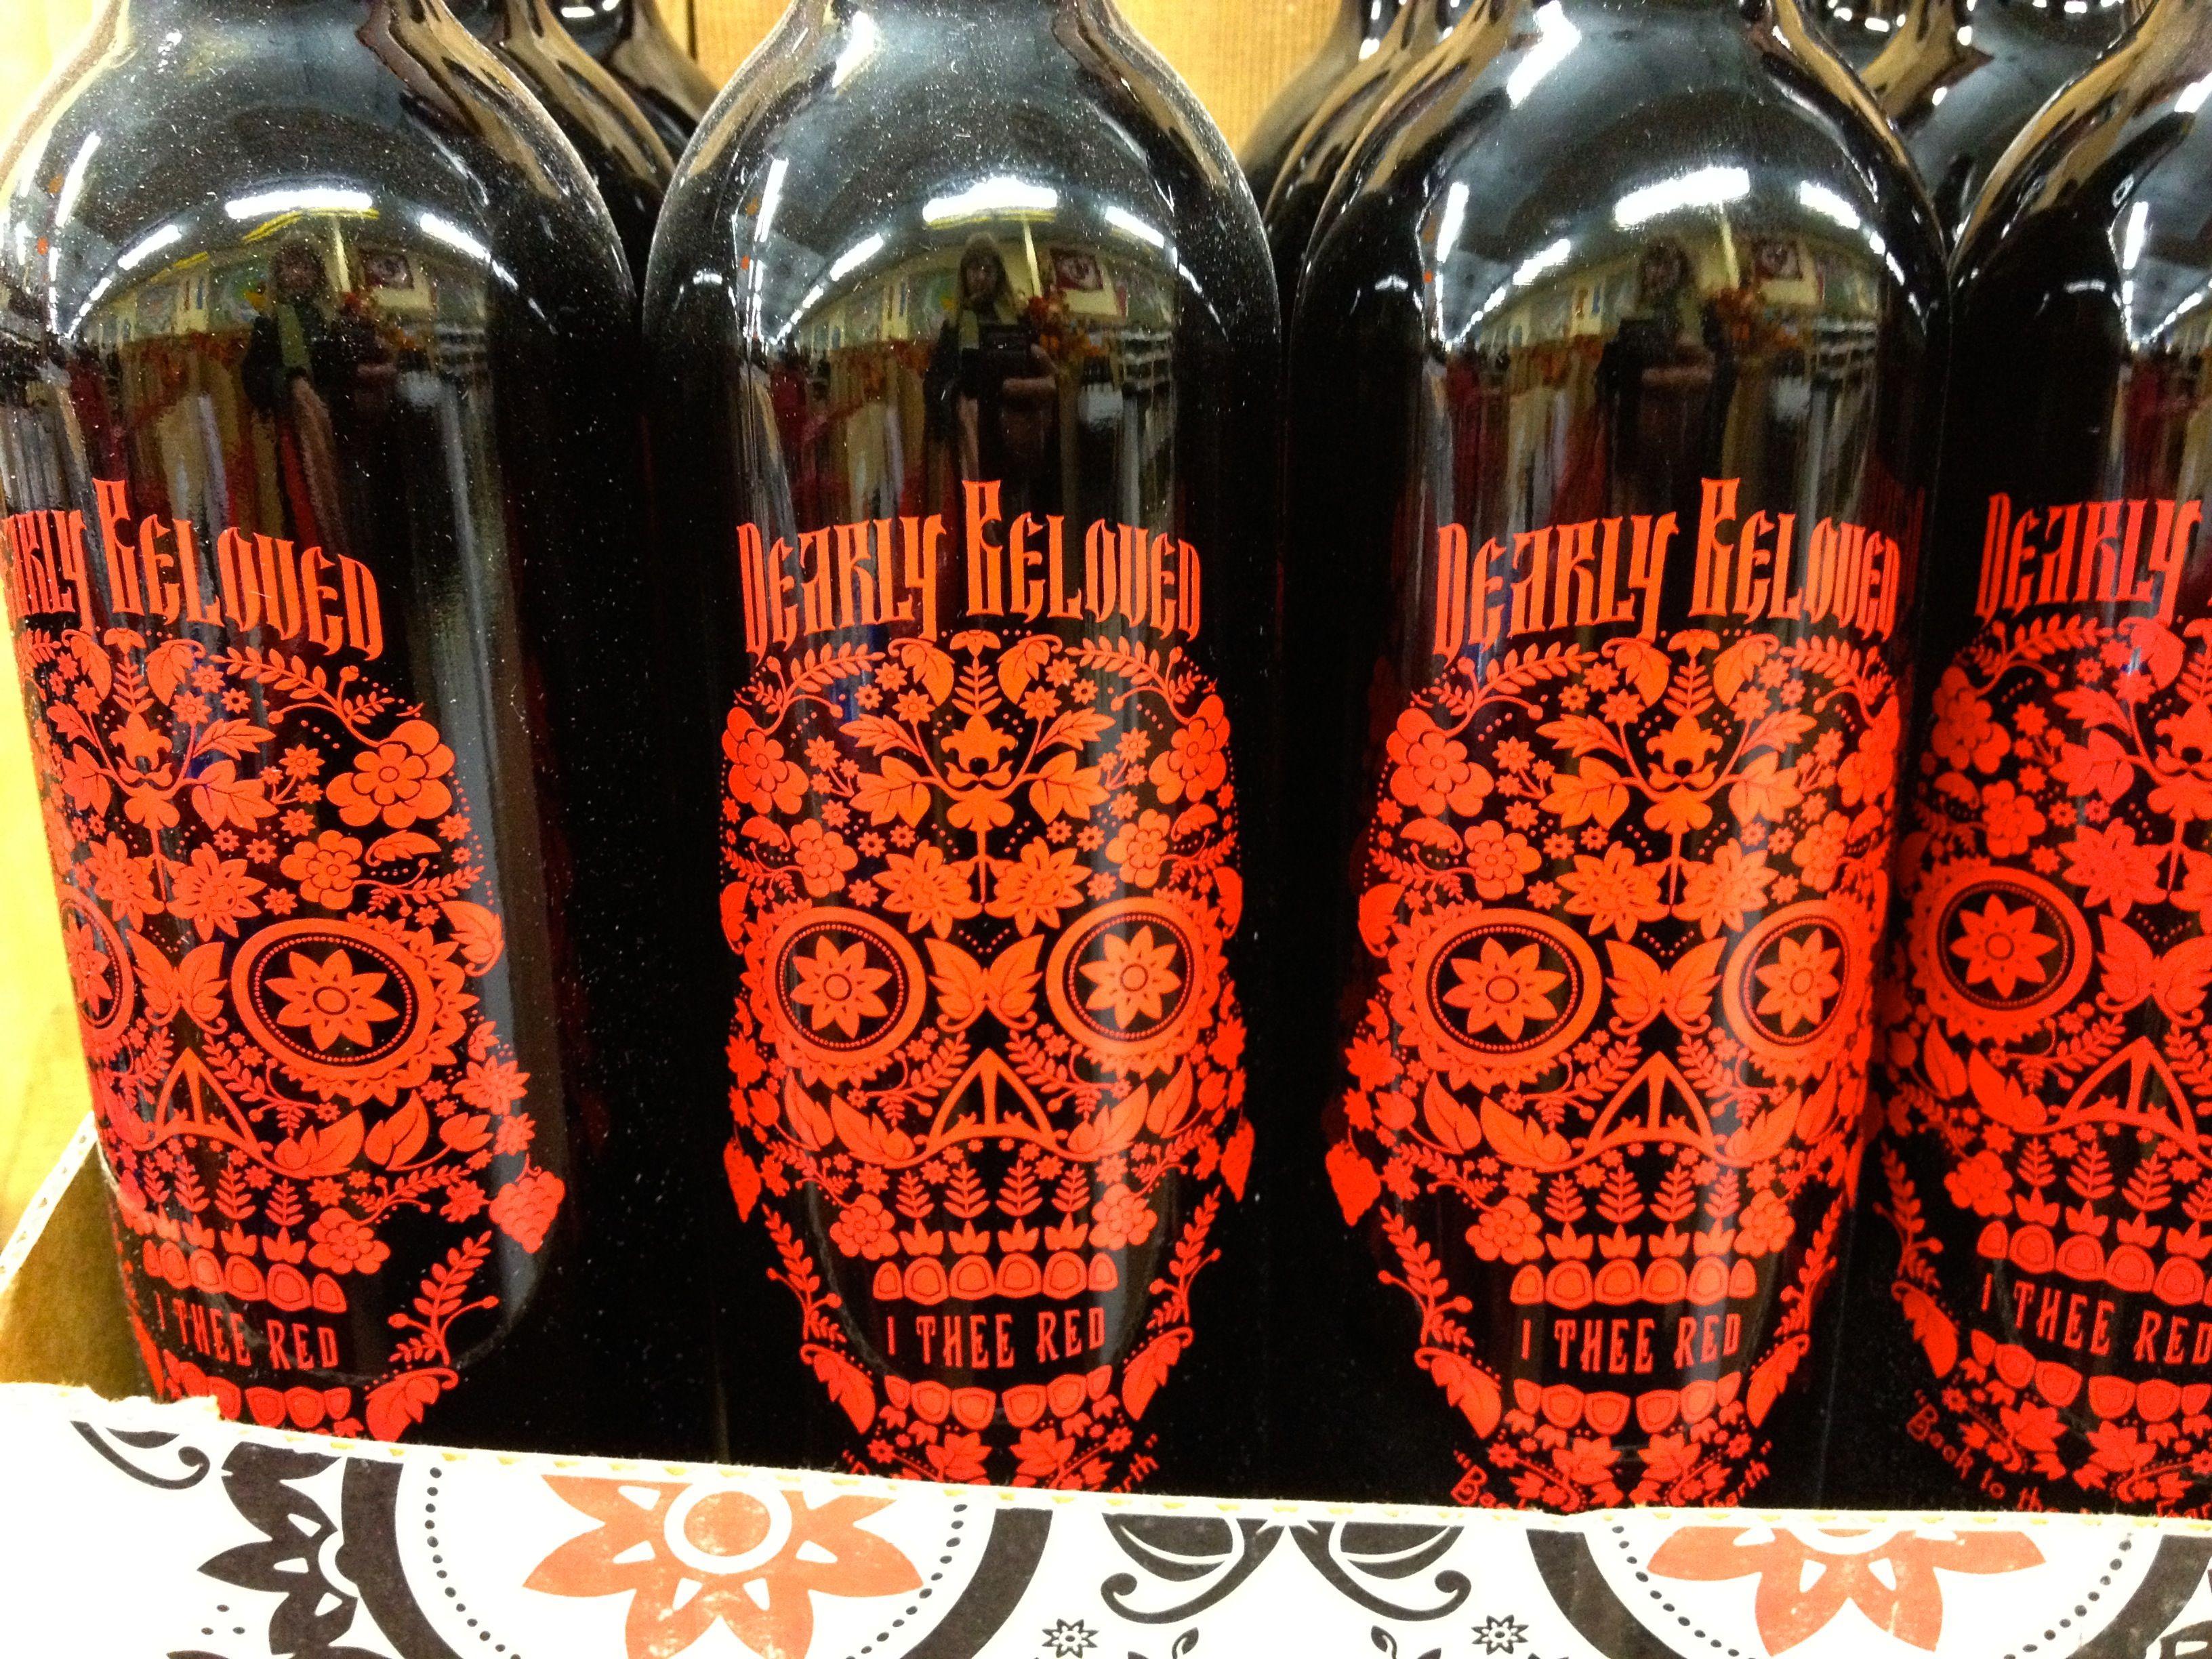 Pin By Bizby On Tasty Beverages Halloween Wine Wine Wine Bottle